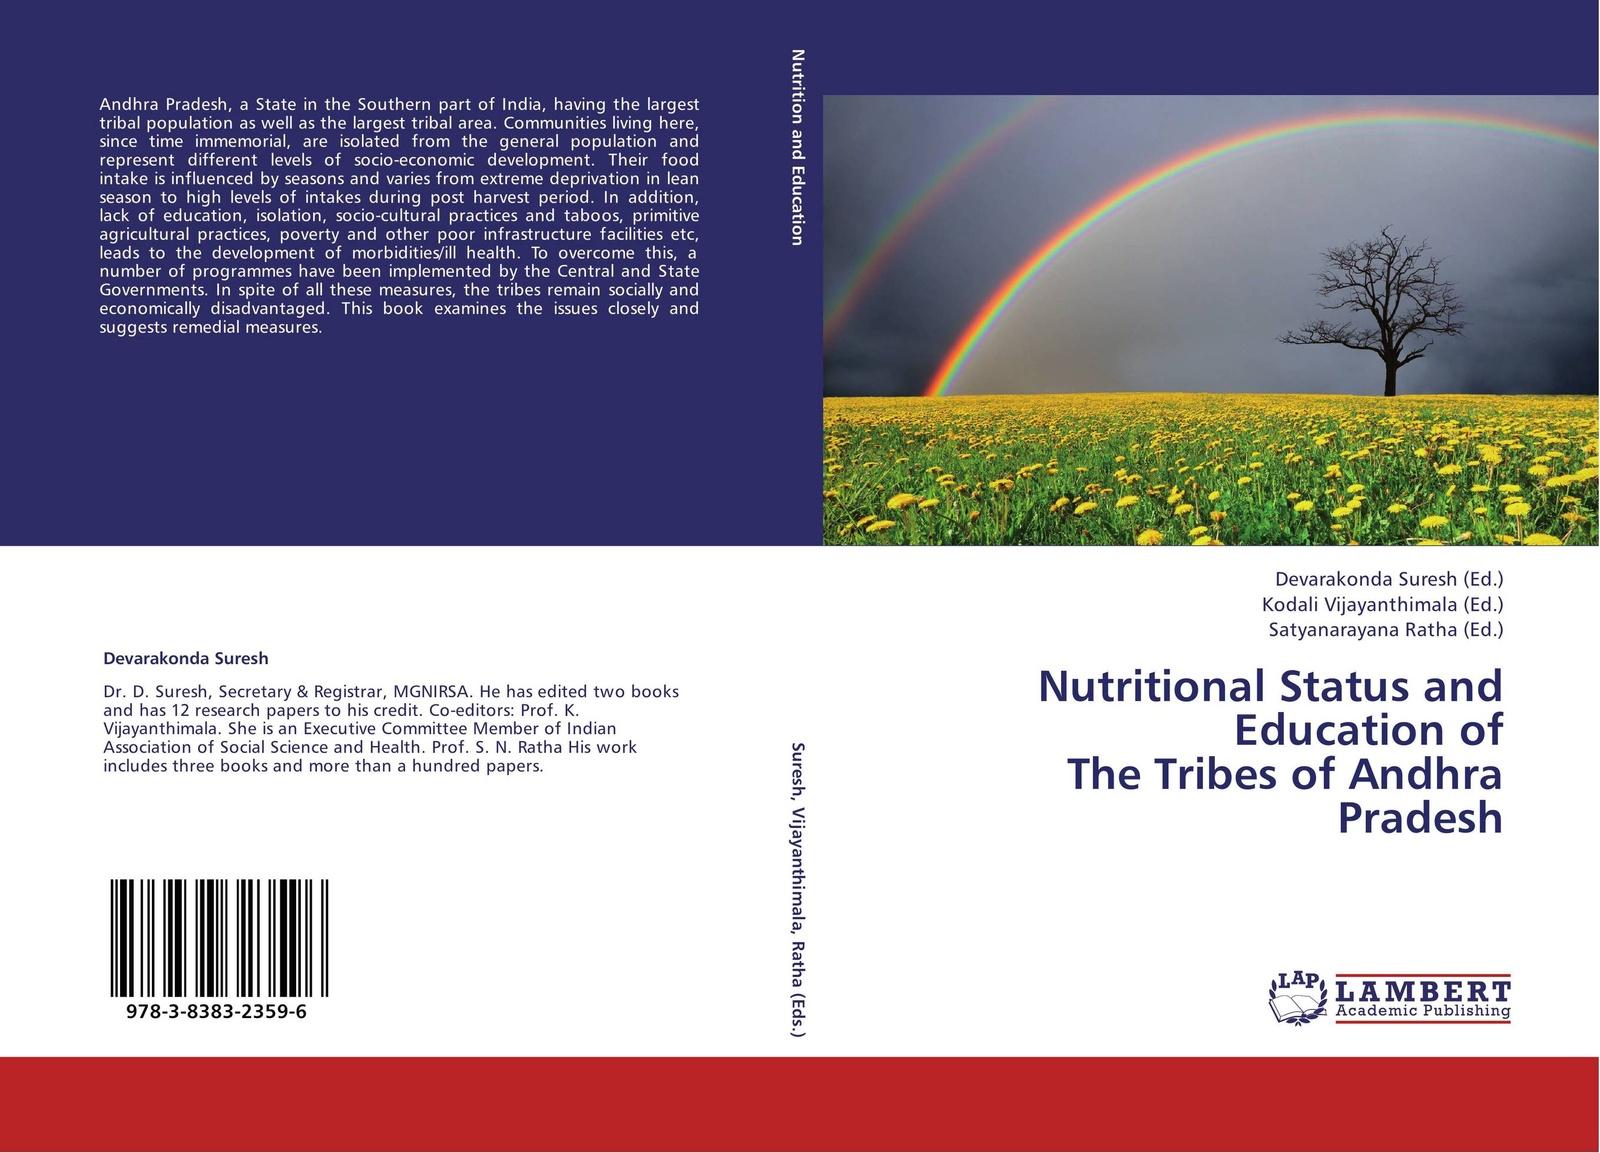 Devarakonda Suresh,Kodali Vijayanthimala and Satyanarayana Ratha Nutritional Status and Education of The Tribes of Andhra Pradesh цена